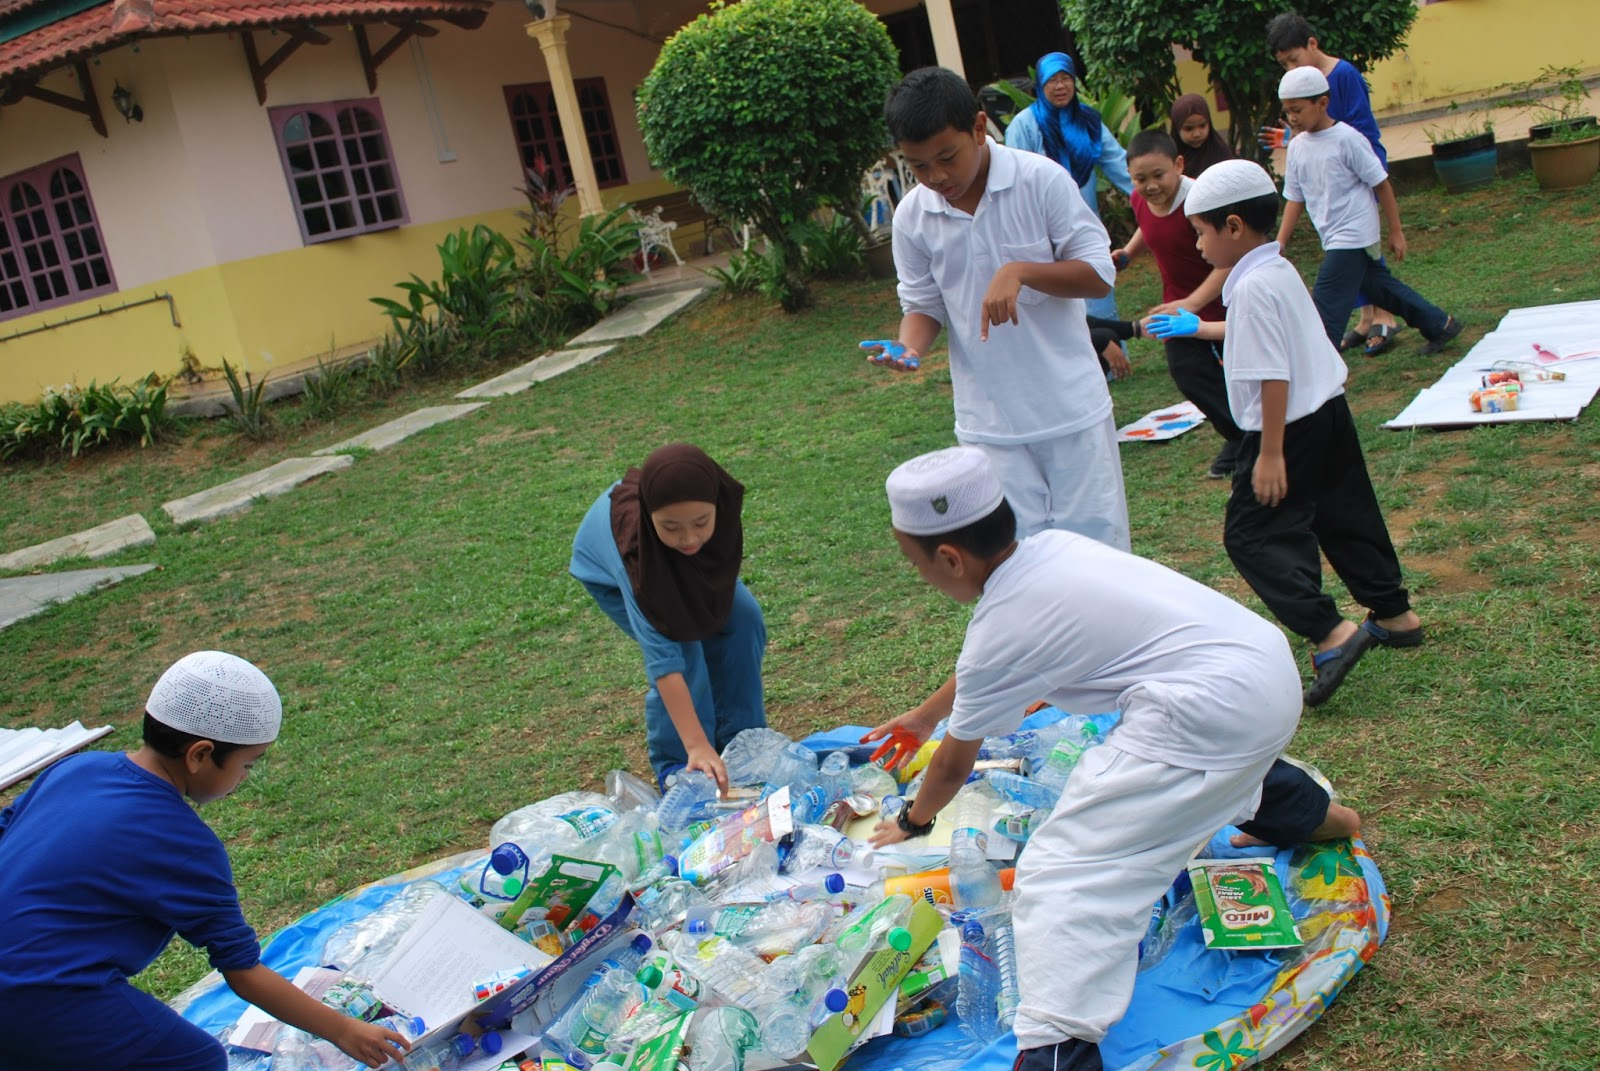 PUSAT KITAR SEMULA PKSUKM BANDAR BARU BANGI UKM  : DSC0174 from pksukm.blogspot.com size 1600 x 1071 jpeg 399kB